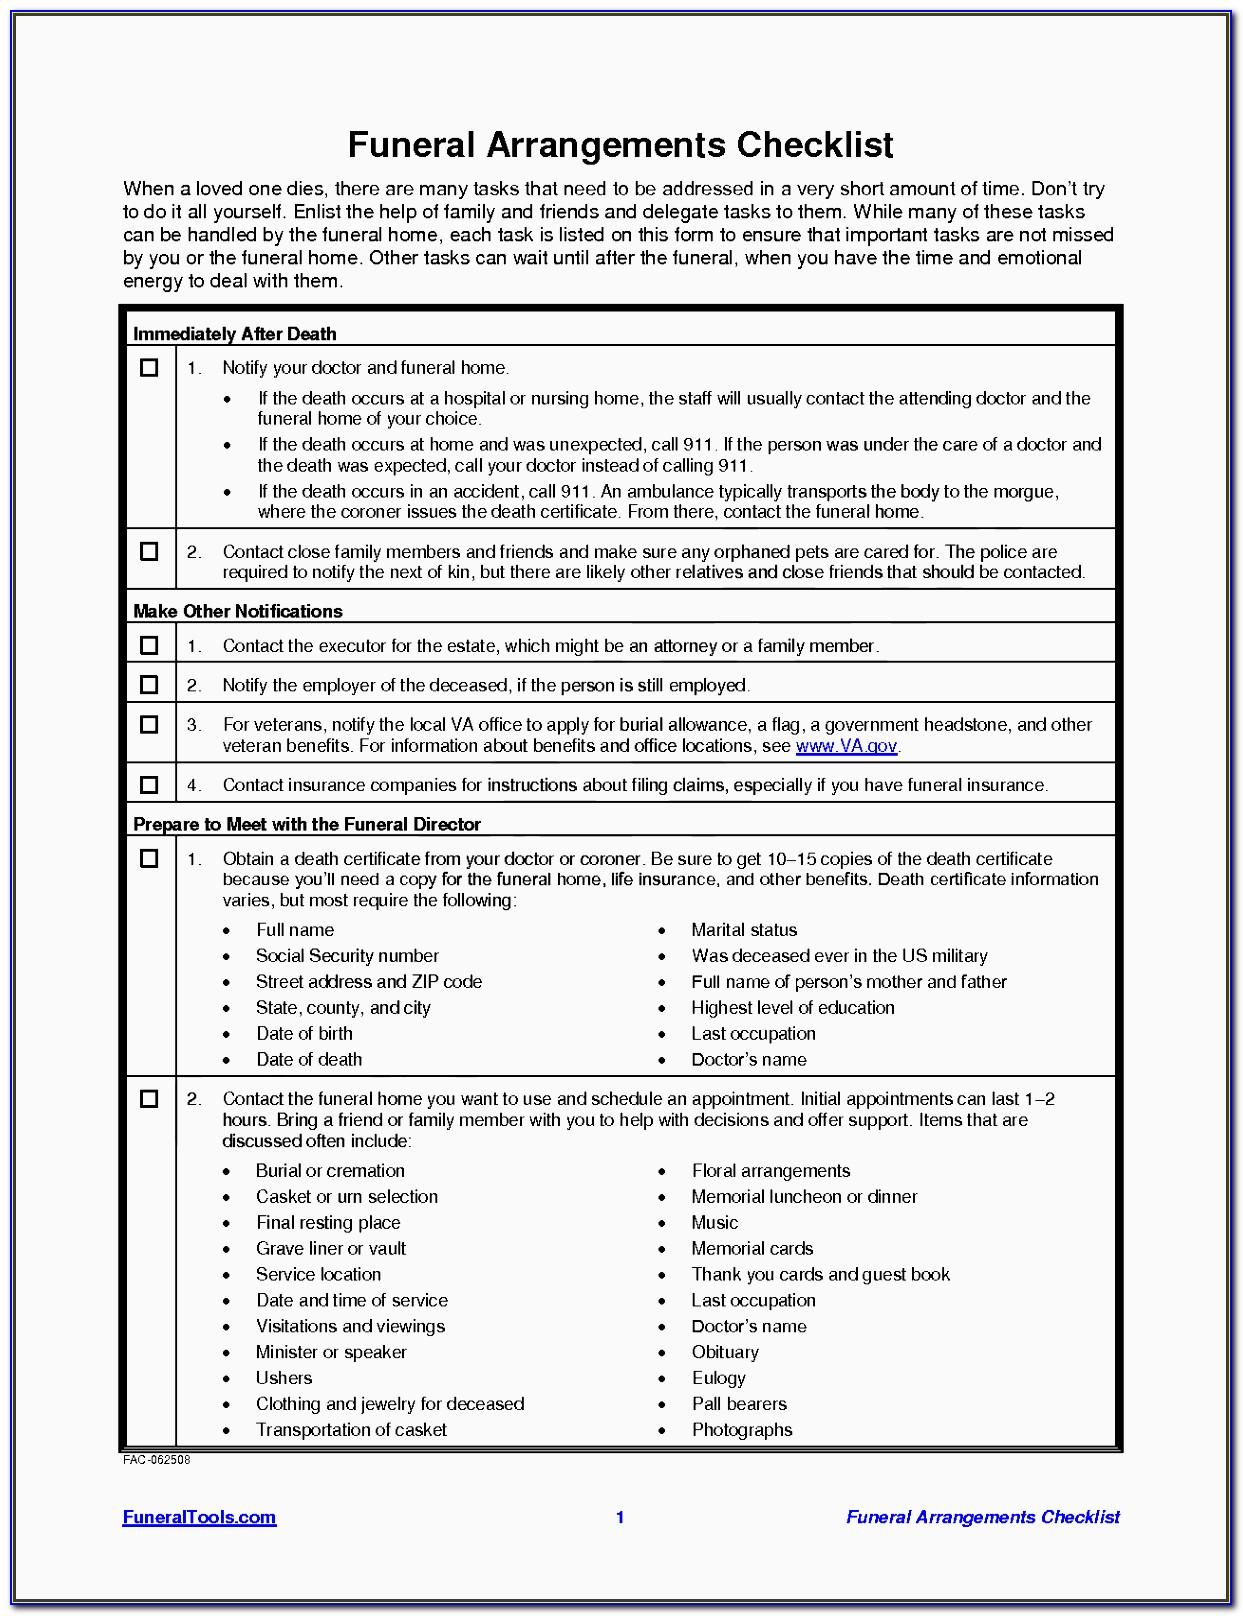 Funeral Planning Checklist Printable